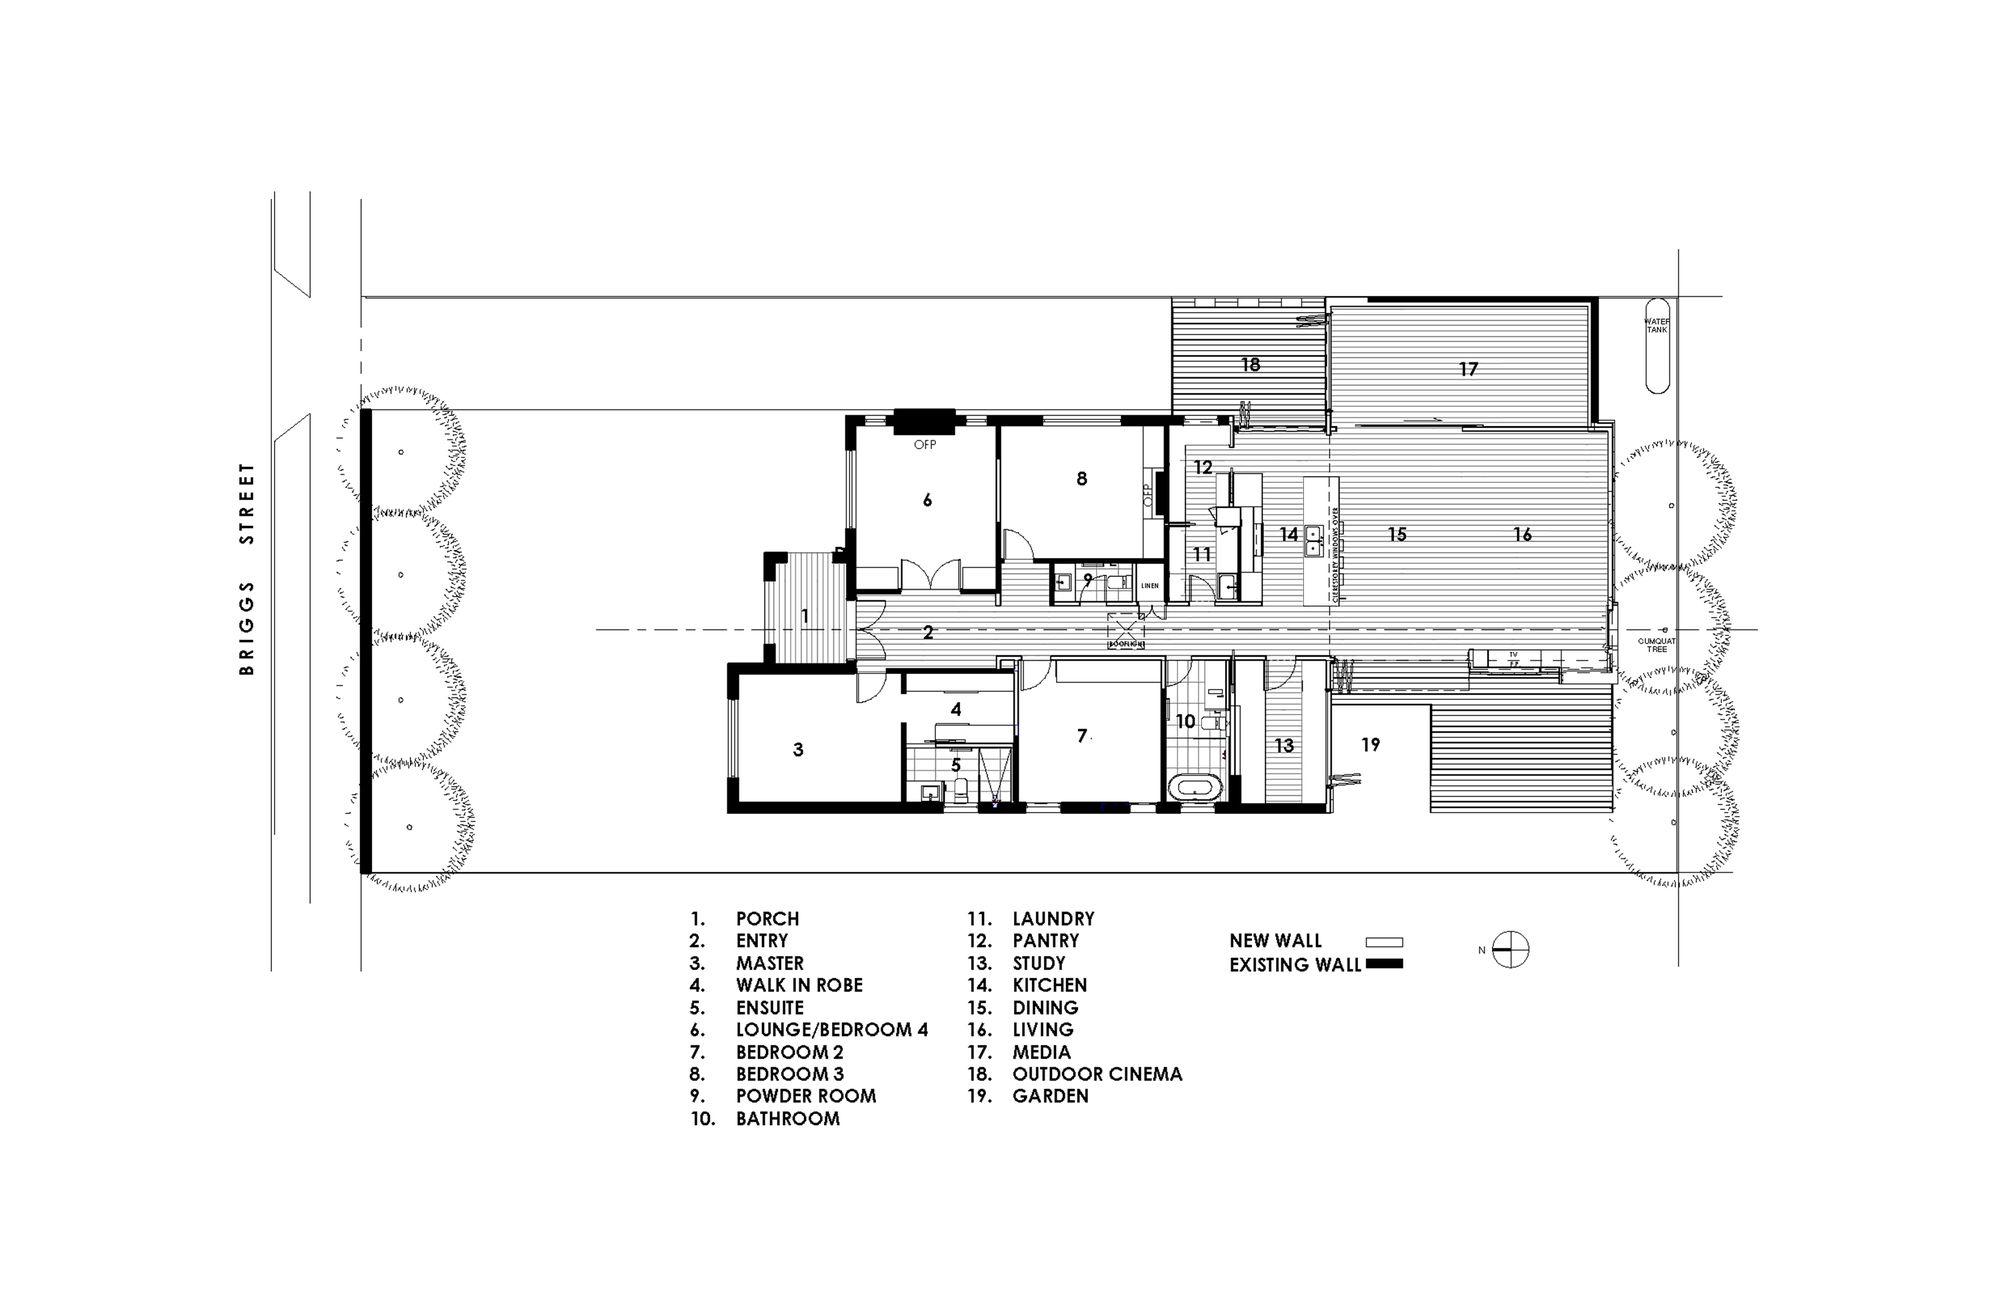 Gallery Of Cumquat Tree House Megowan Architectural 18 Tree House Tree House Designs Floor Plan Design